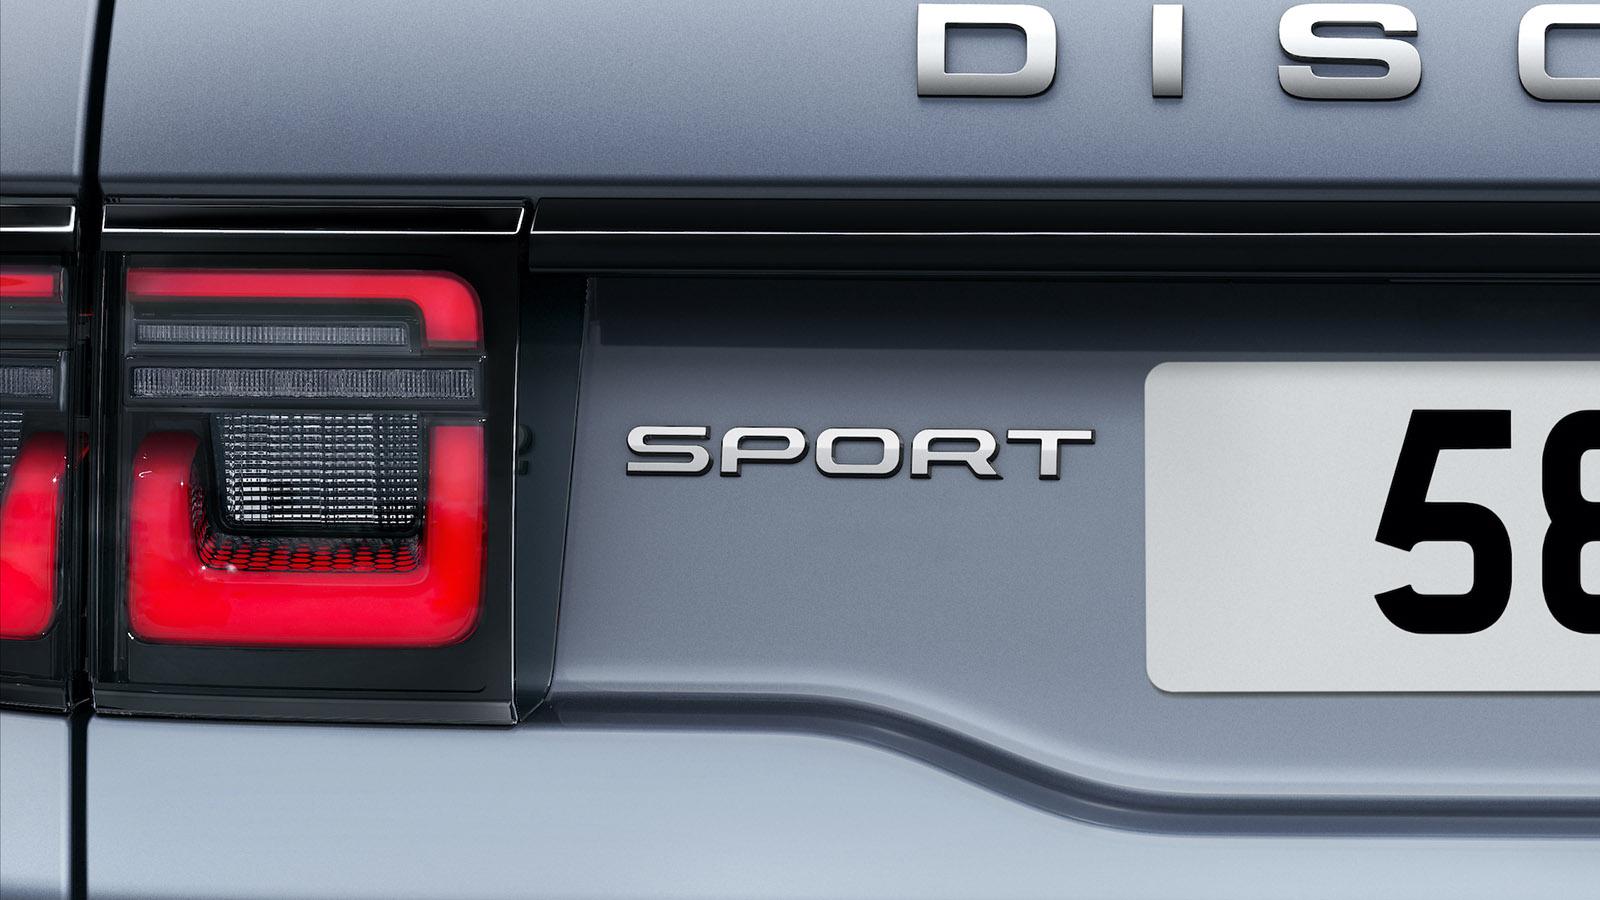 Đuôi xe Land Rover Discovery Sport 2020